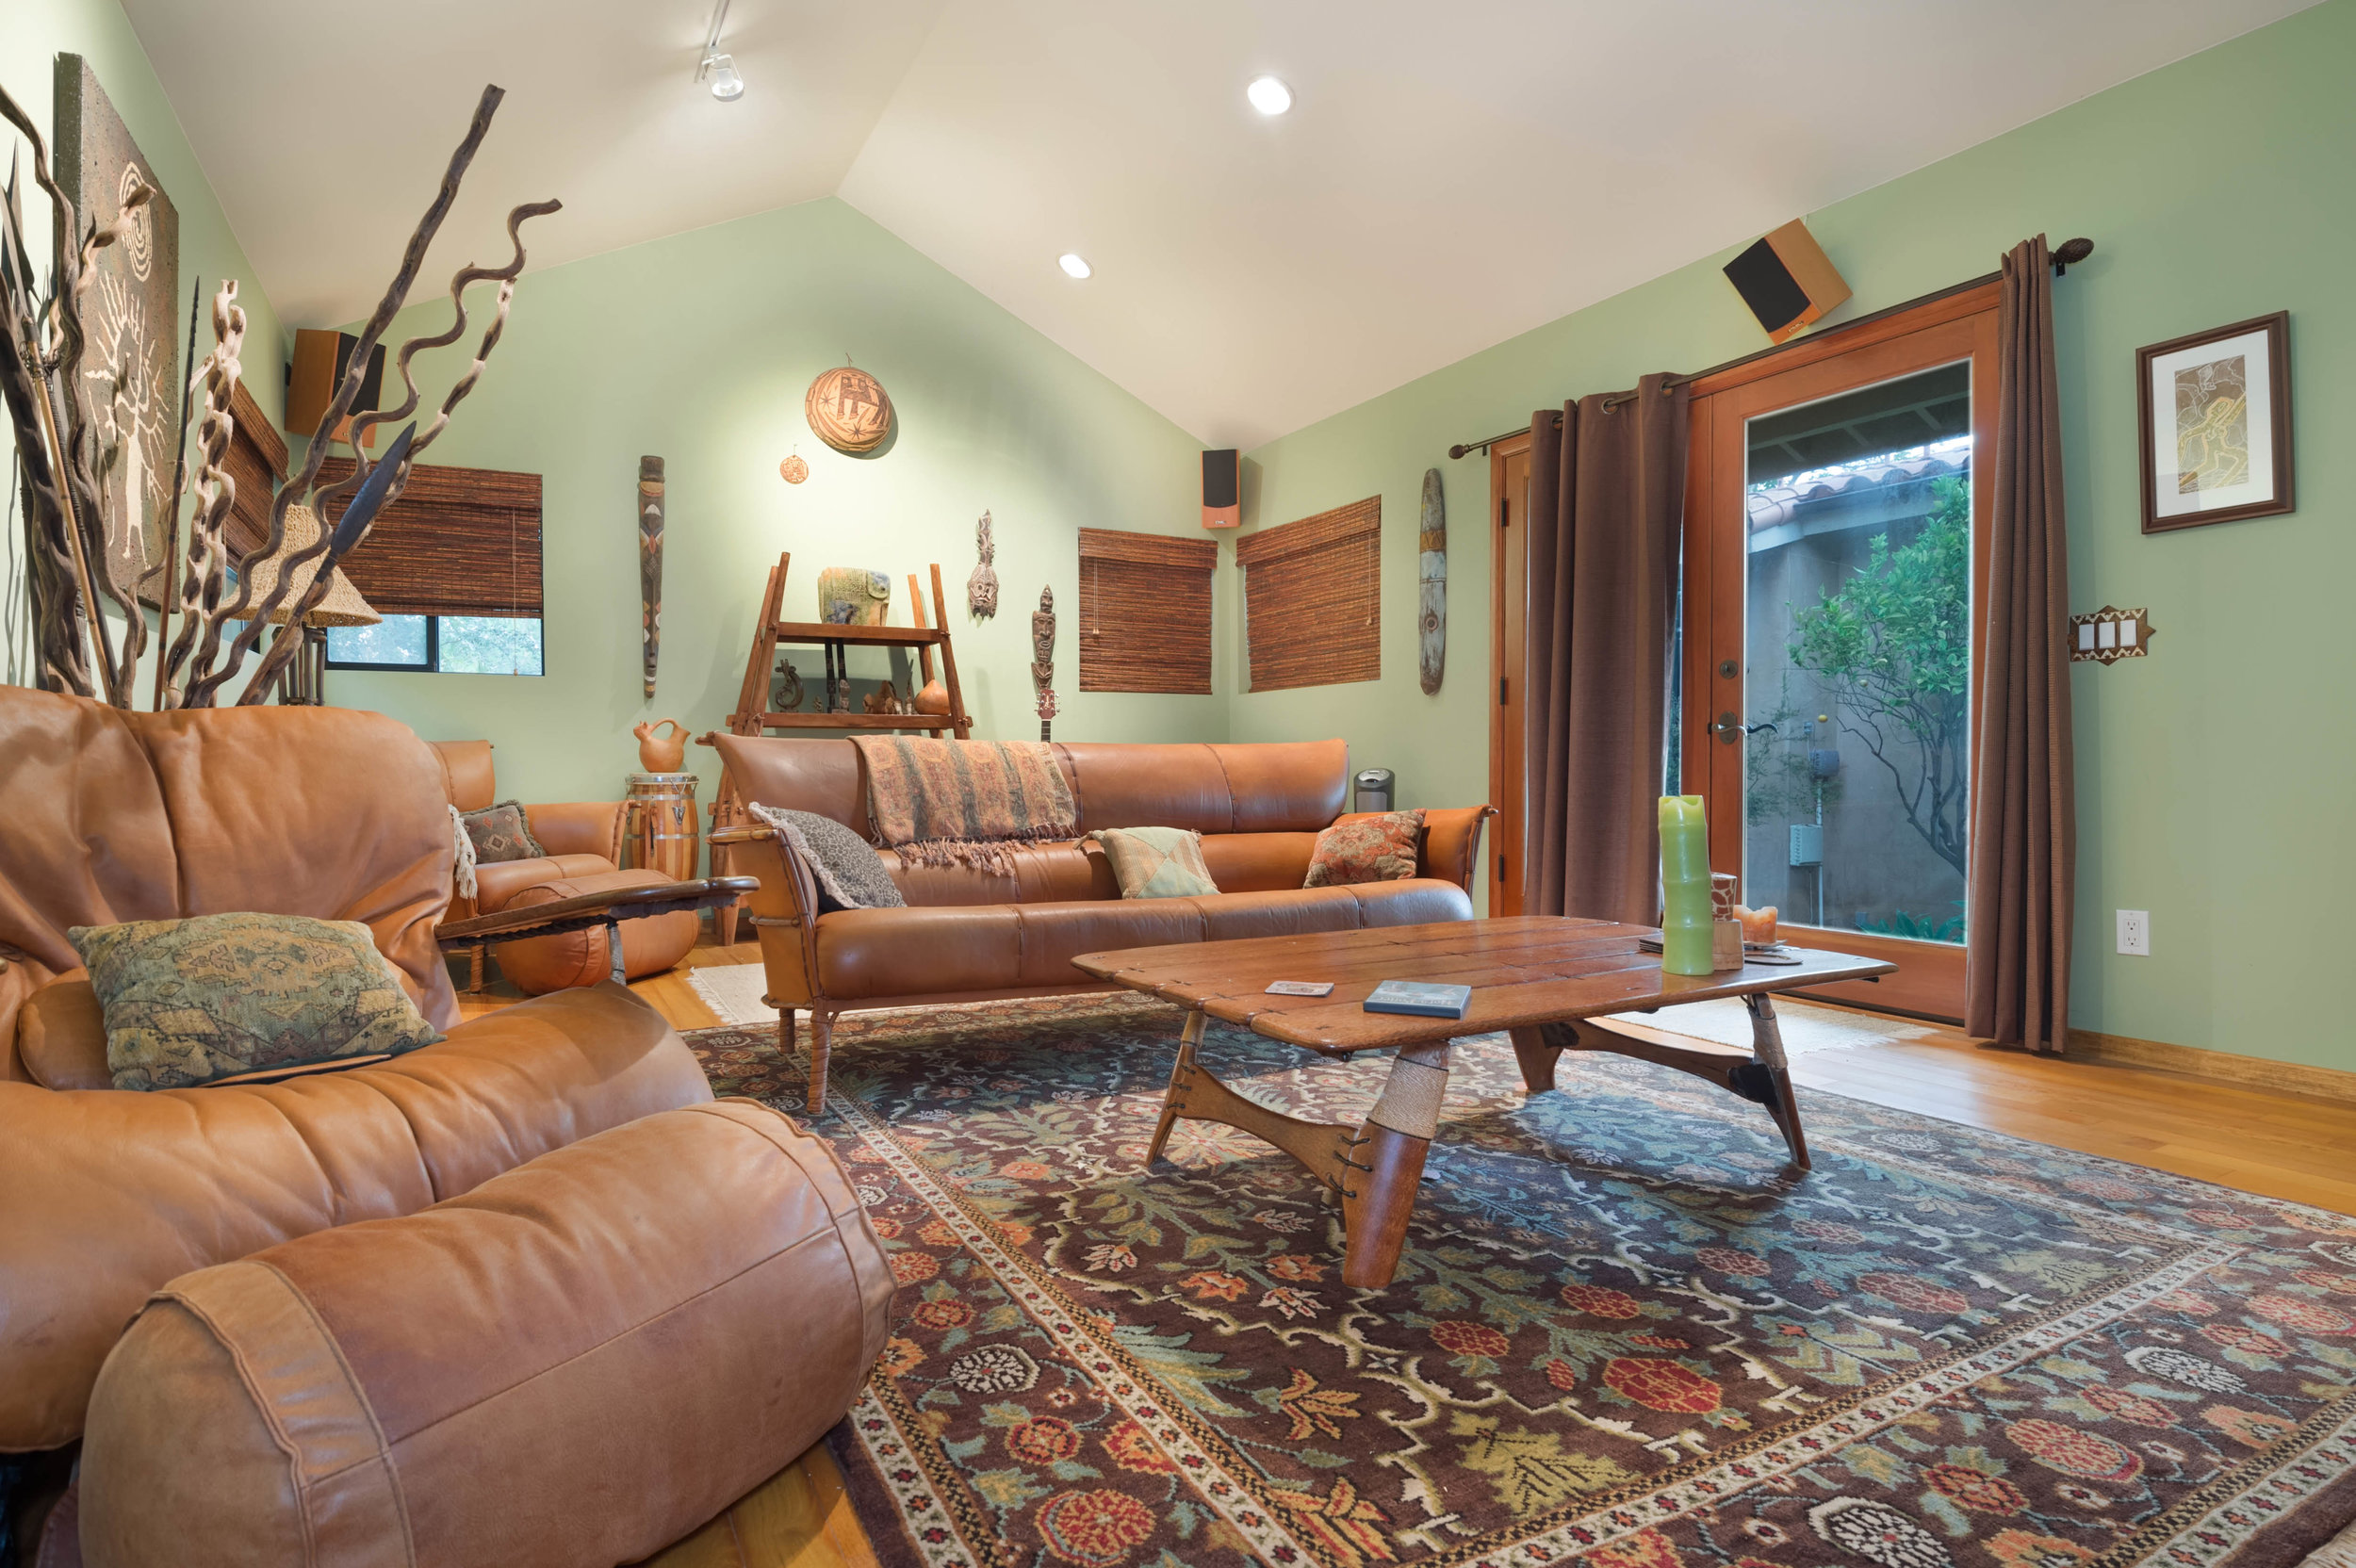 027 guest house 29660 Harvester Road Malibu For Sale The Malibu Life Team Luxury Real Estate.jpg